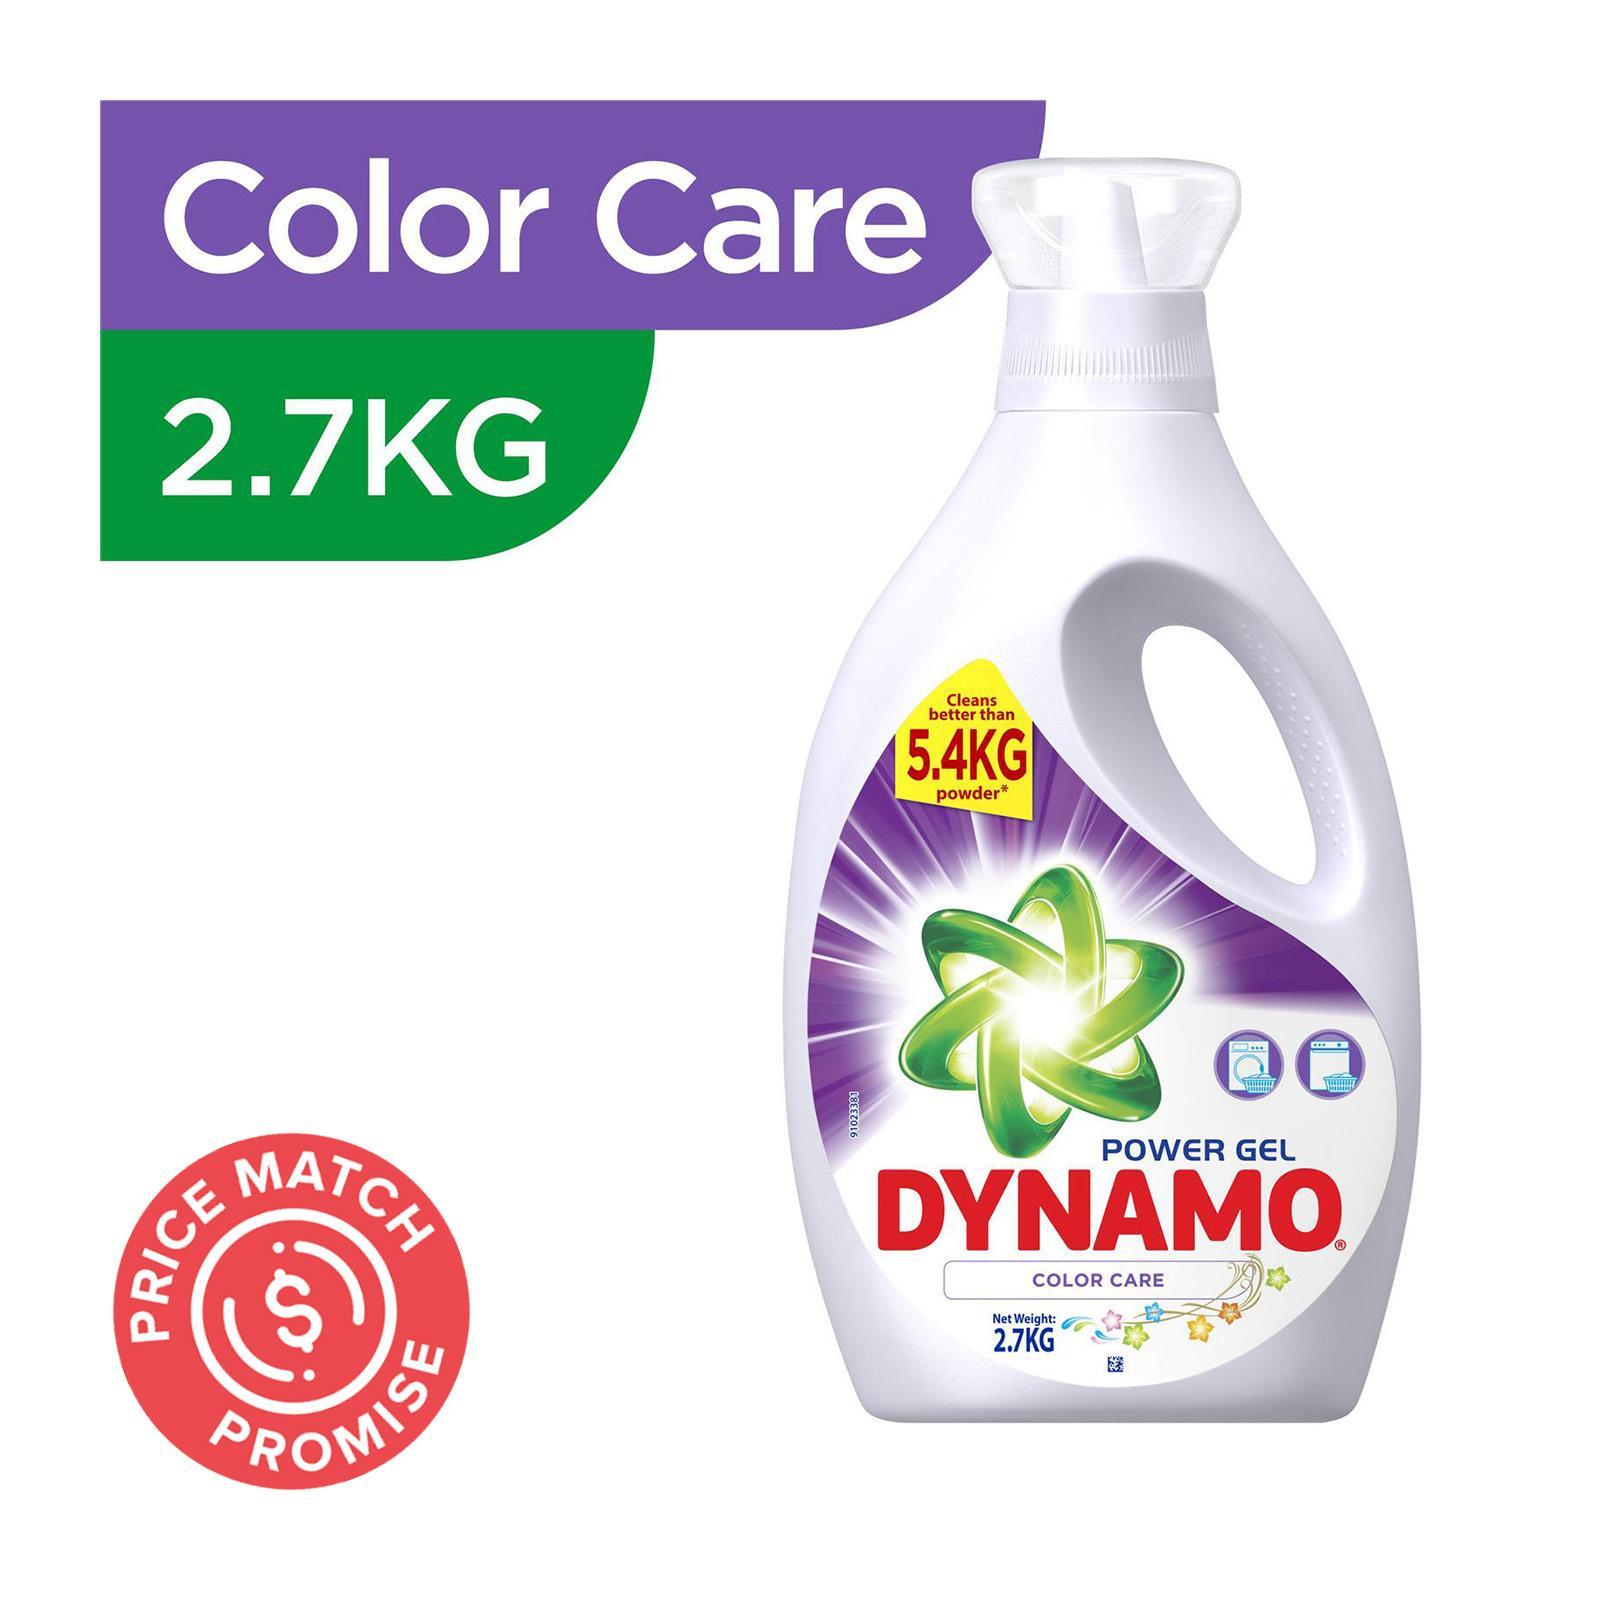 Dynamo Power Gel Color Care Laundry Detergent